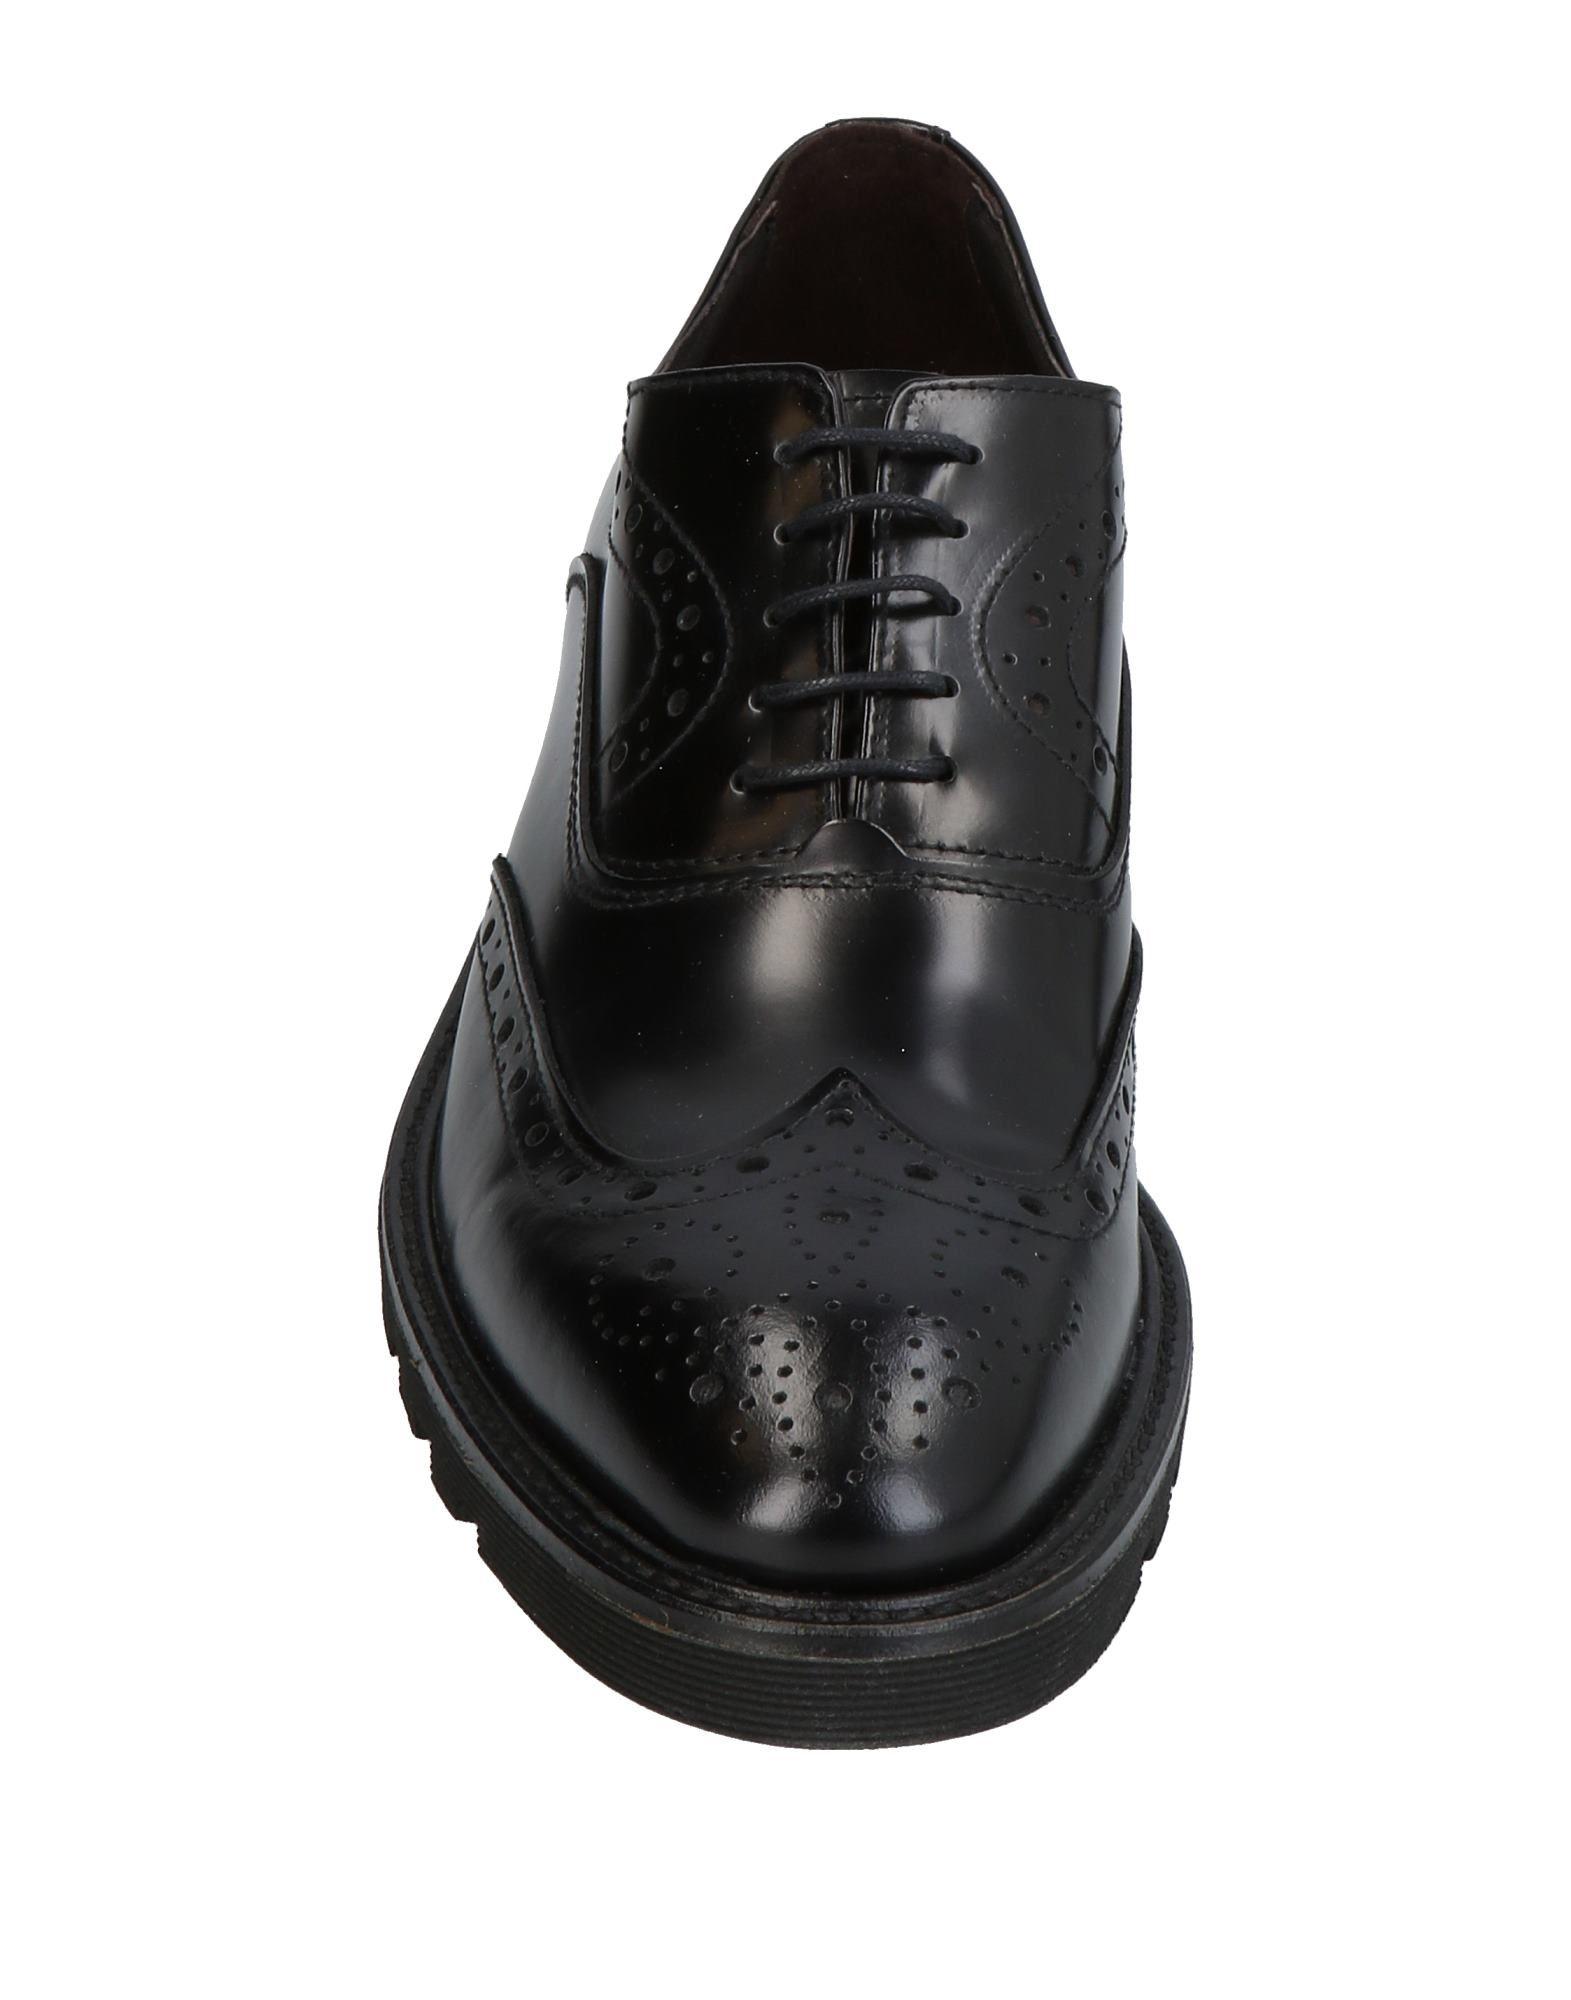 CHAUSSURES - Chaussures à lacetsJohn Bakery CyBXnUOHn